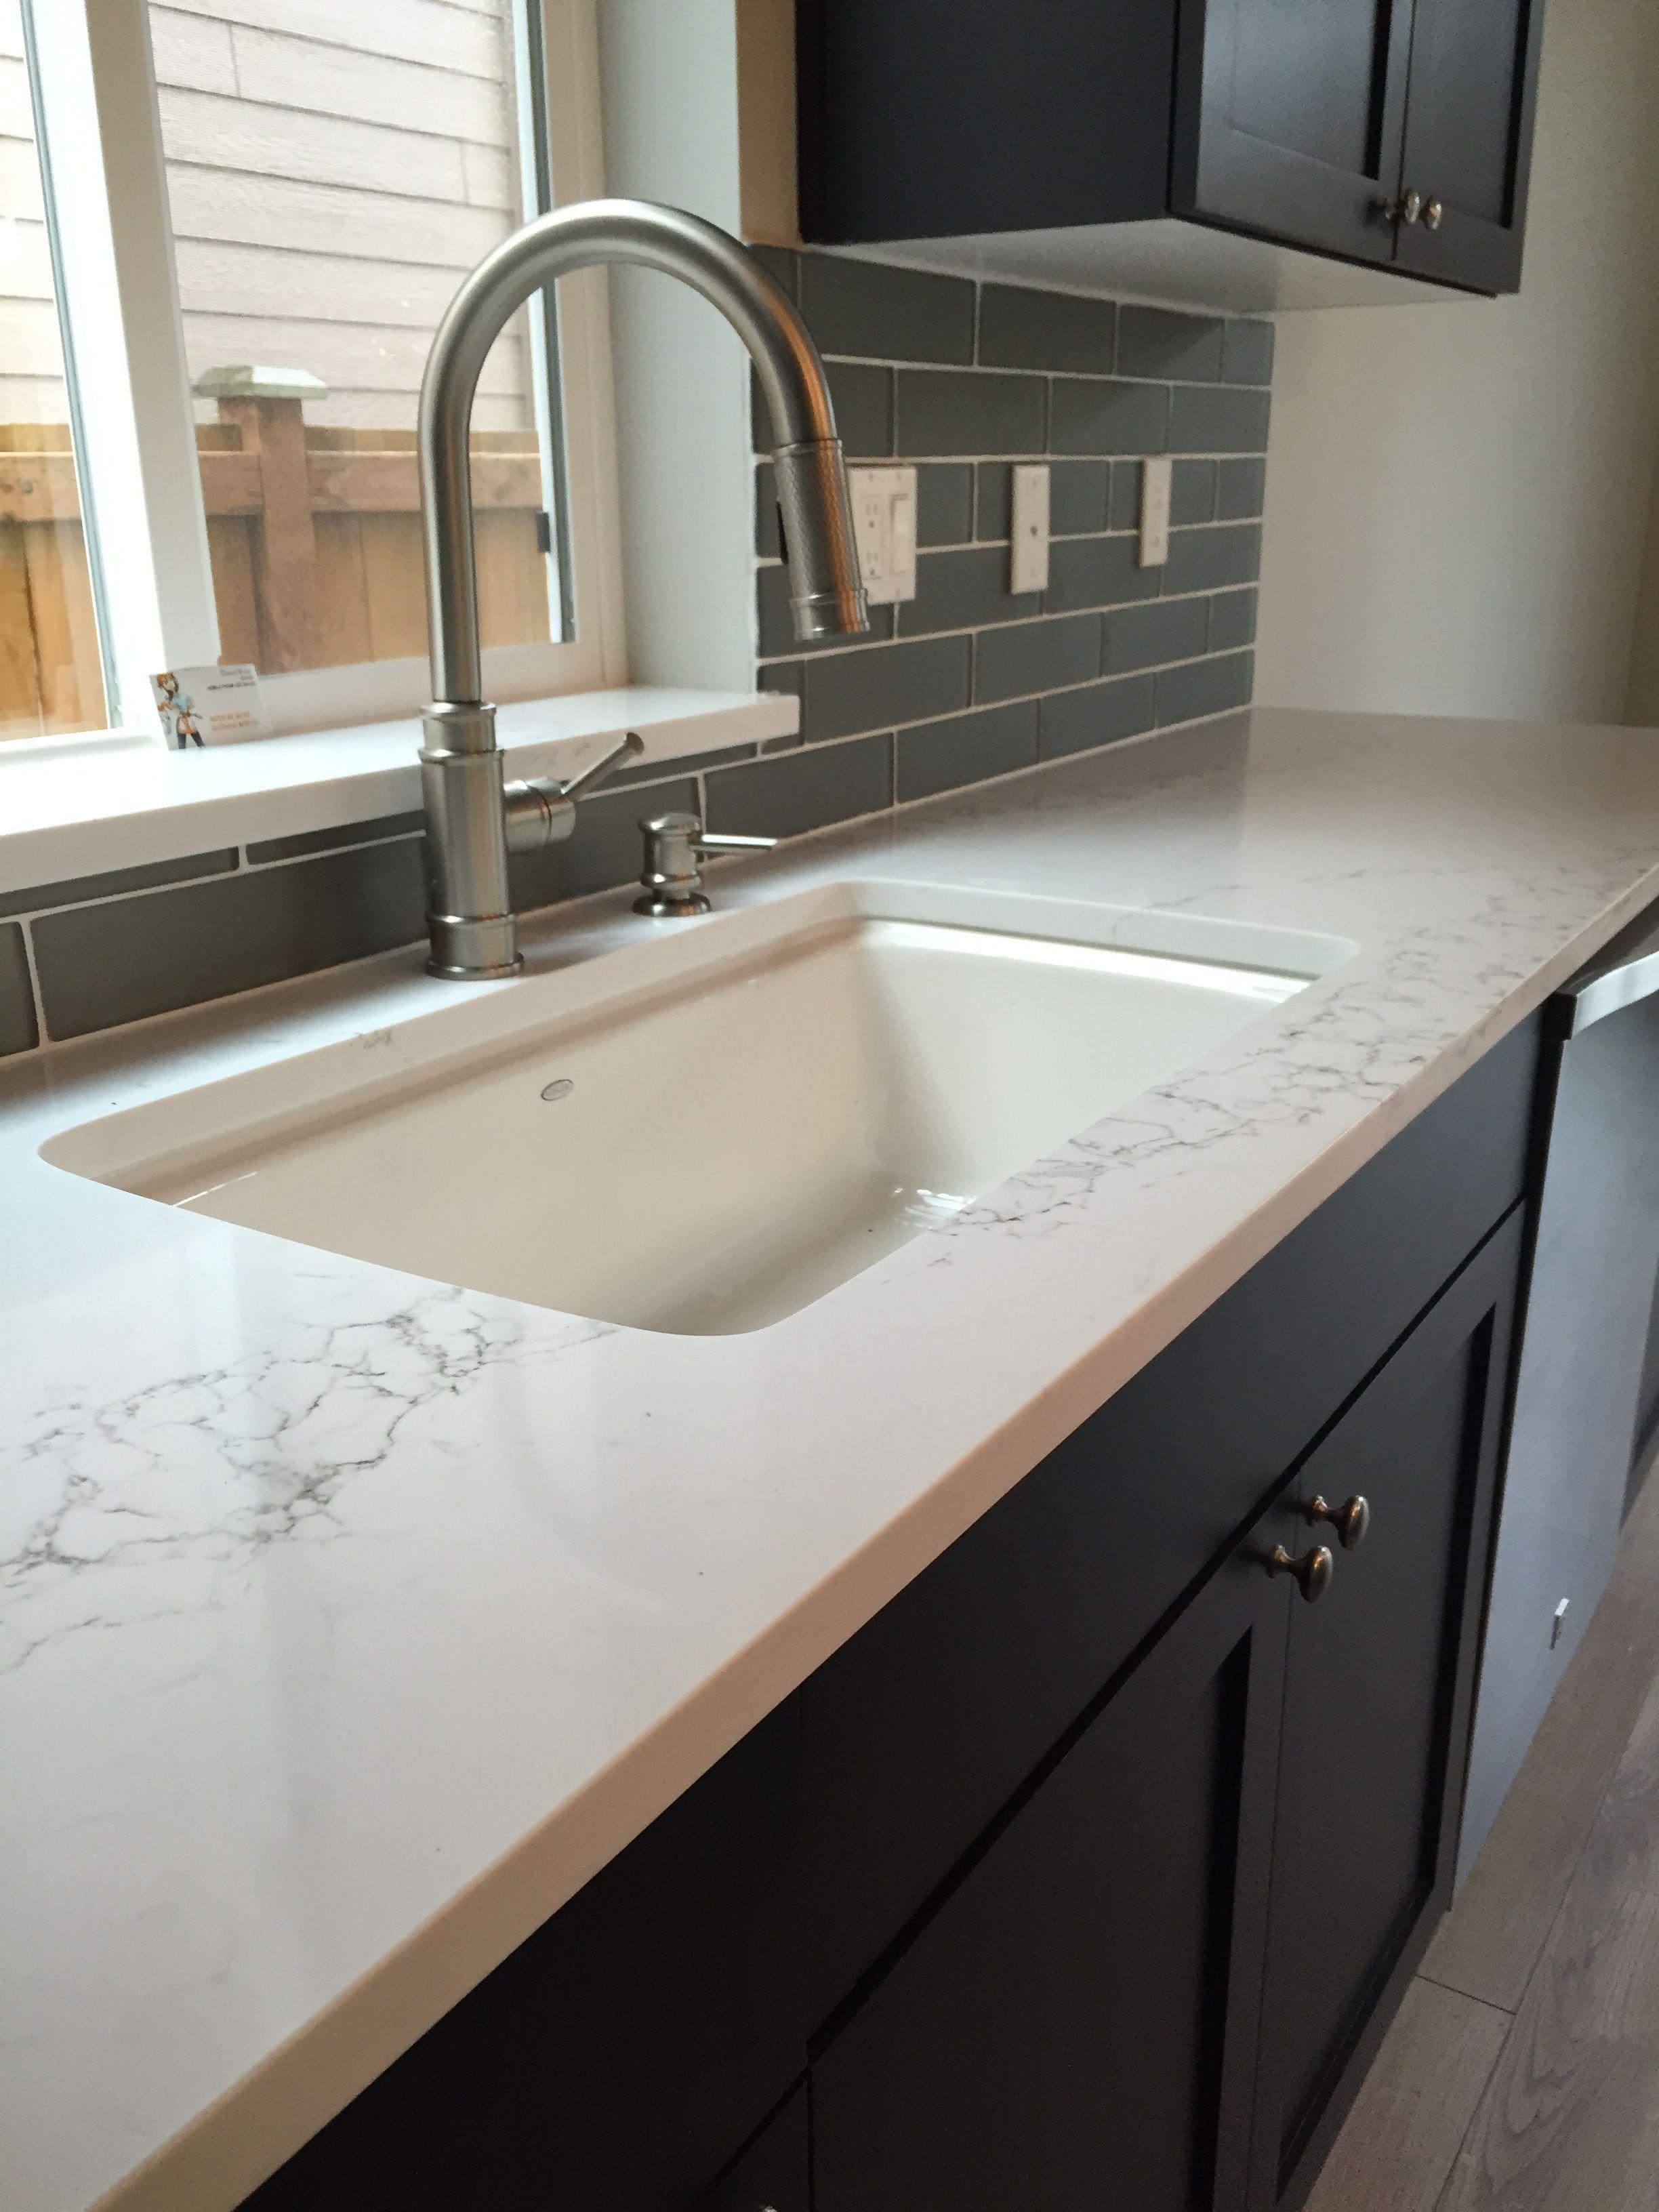 The Glamorous Remodel: Statuario Polished Quartz By Pentel, Glass Tile  Backsplash, Undermount Sink By Kohler